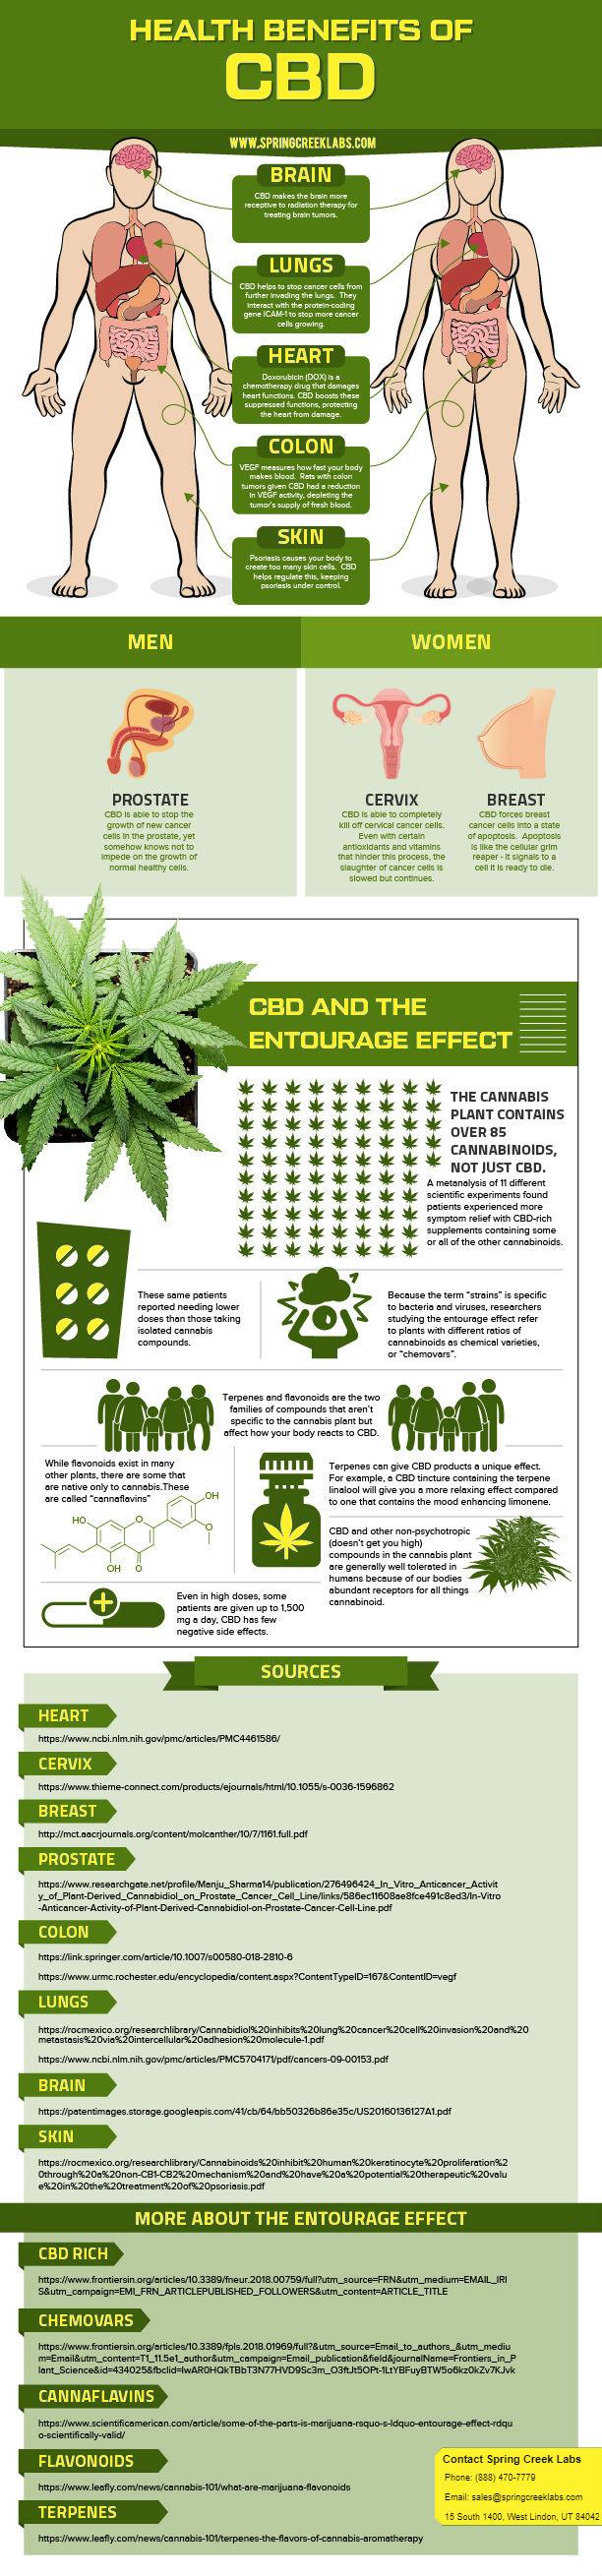 Health Benefits of CBD Infographic